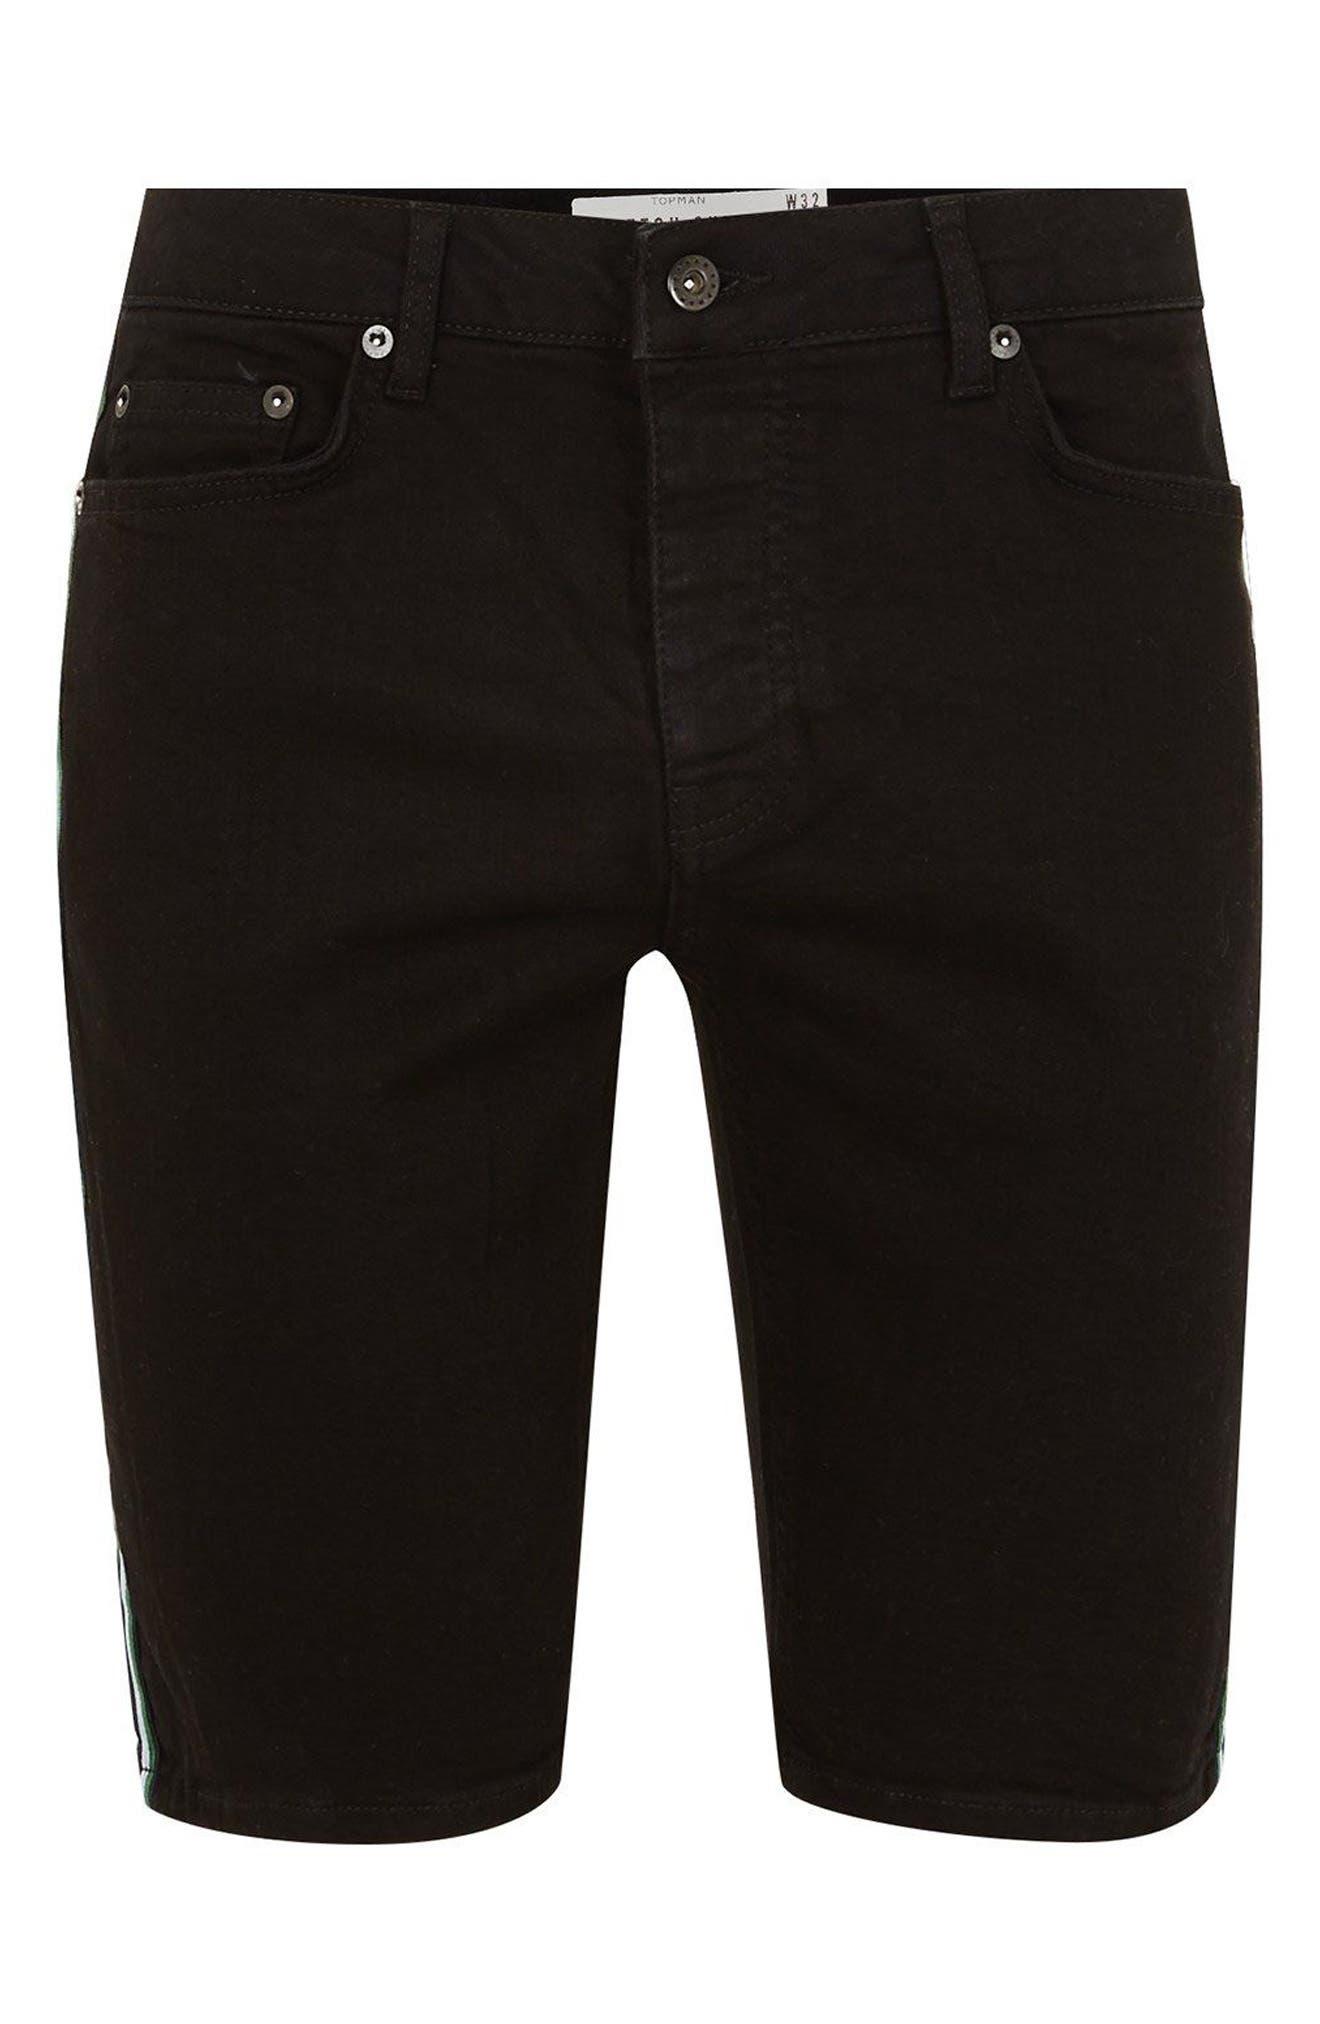 Tape Stretch Skinny Fit Denim Shorts,                             Alternate thumbnail 4, color,                             Black